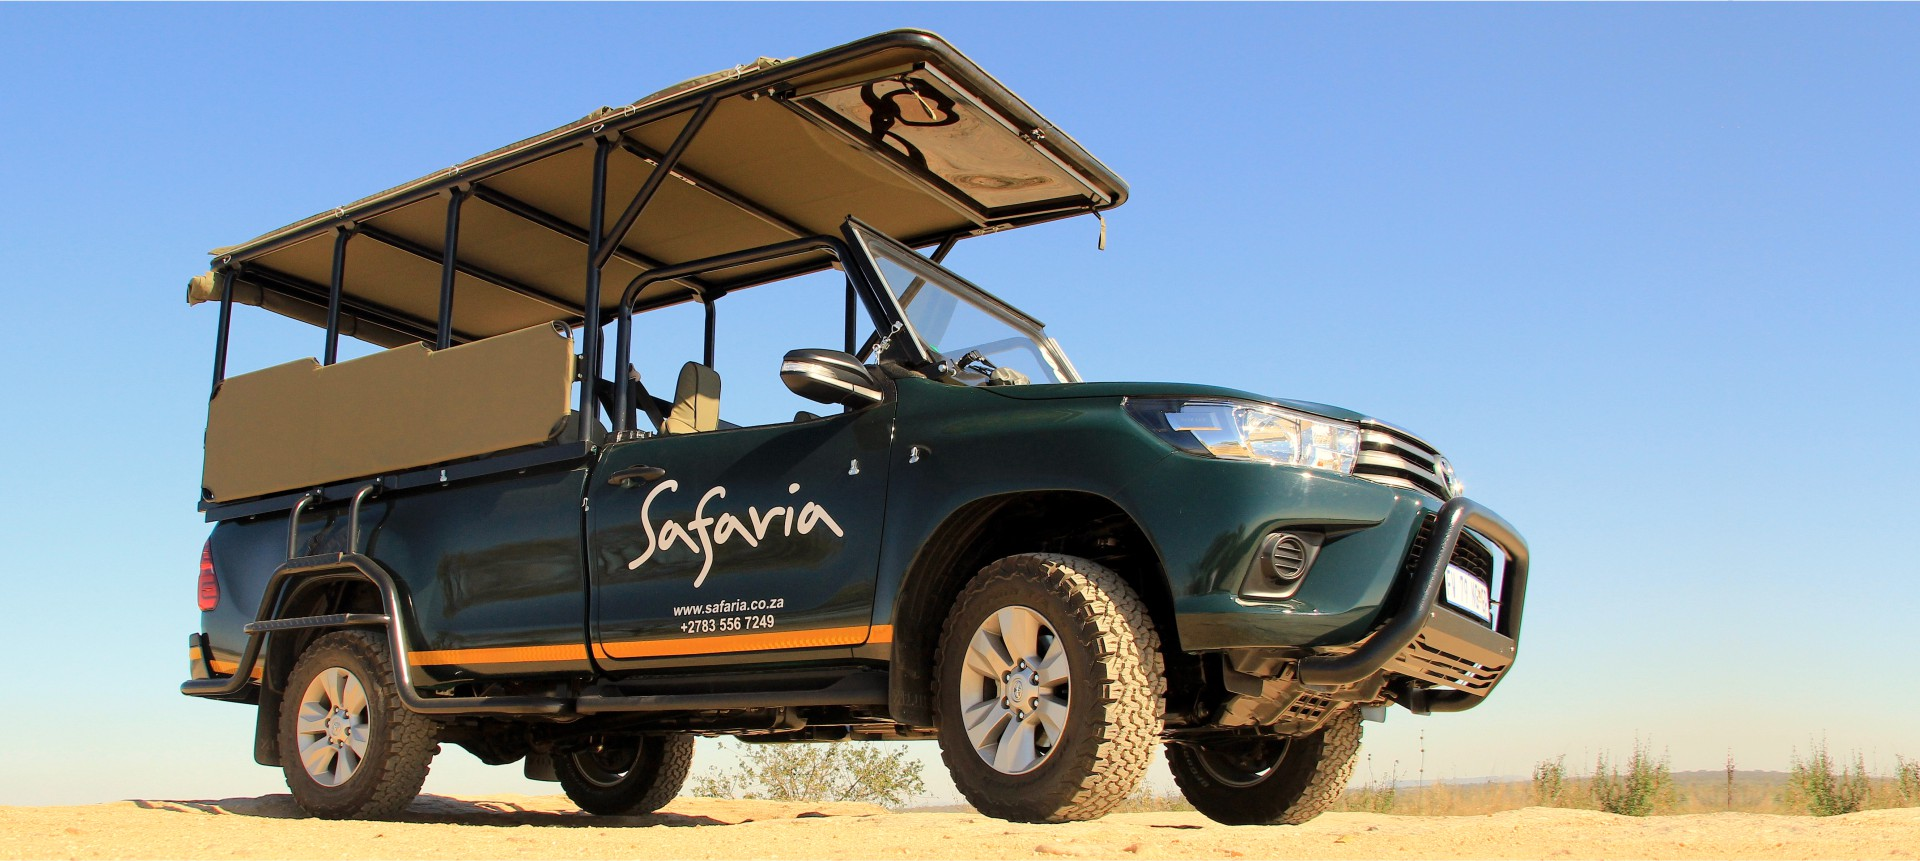 Safaria – banner vehicle 4